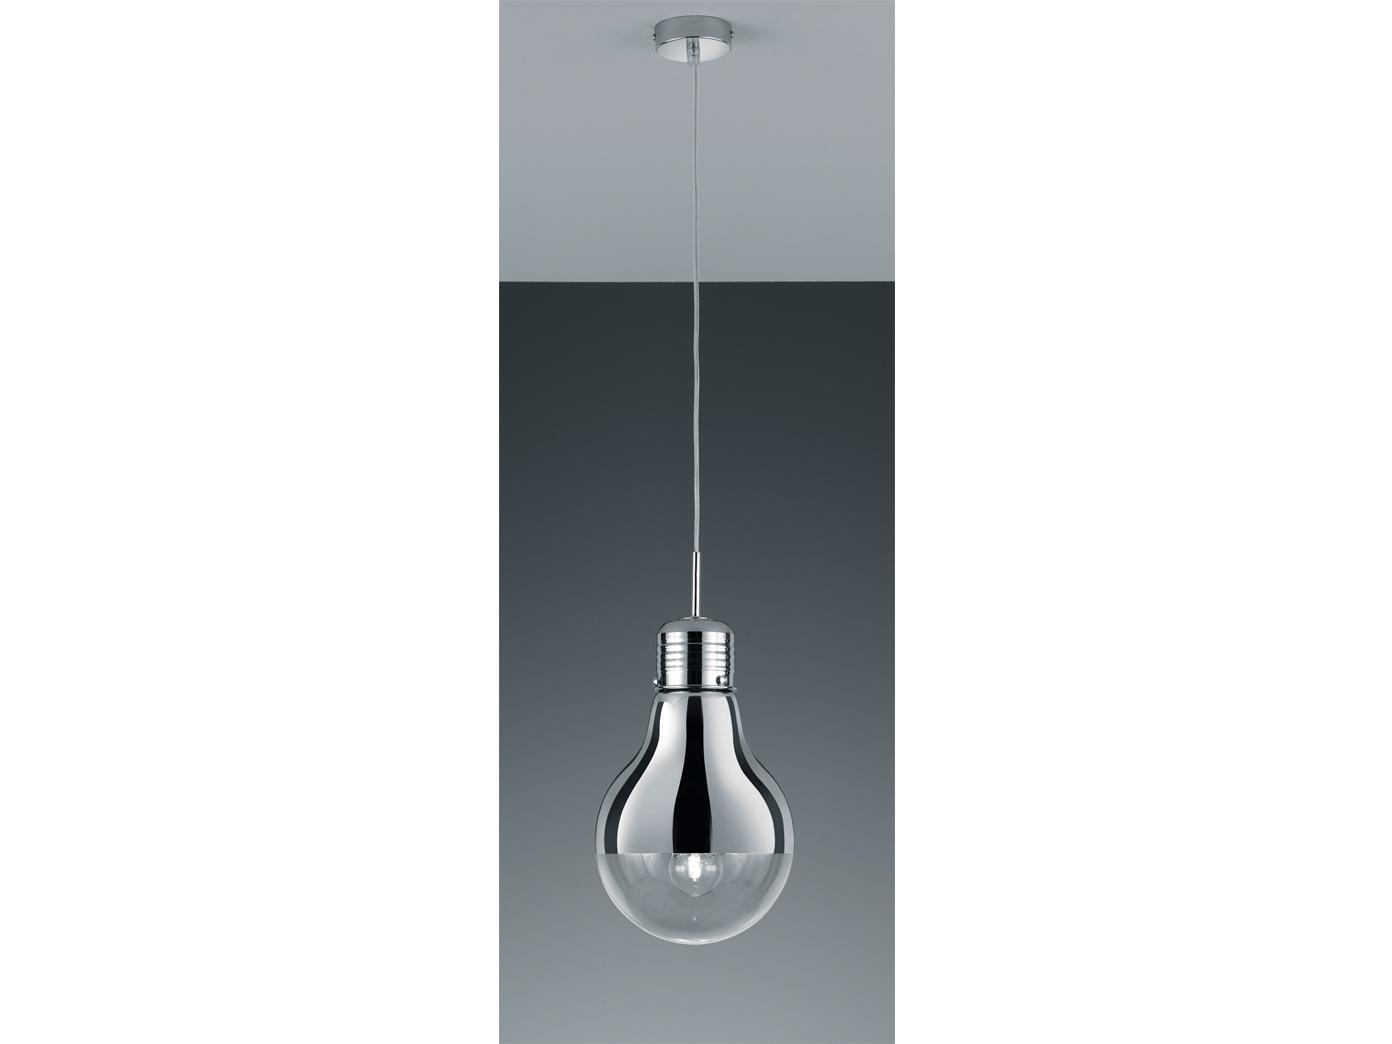 trio pendelleuchte gl hbirne e27 28cm chrom glas verchromt klar 4017807246902 ebay. Black Bedroom Furniture Sets. Home Design Ideas